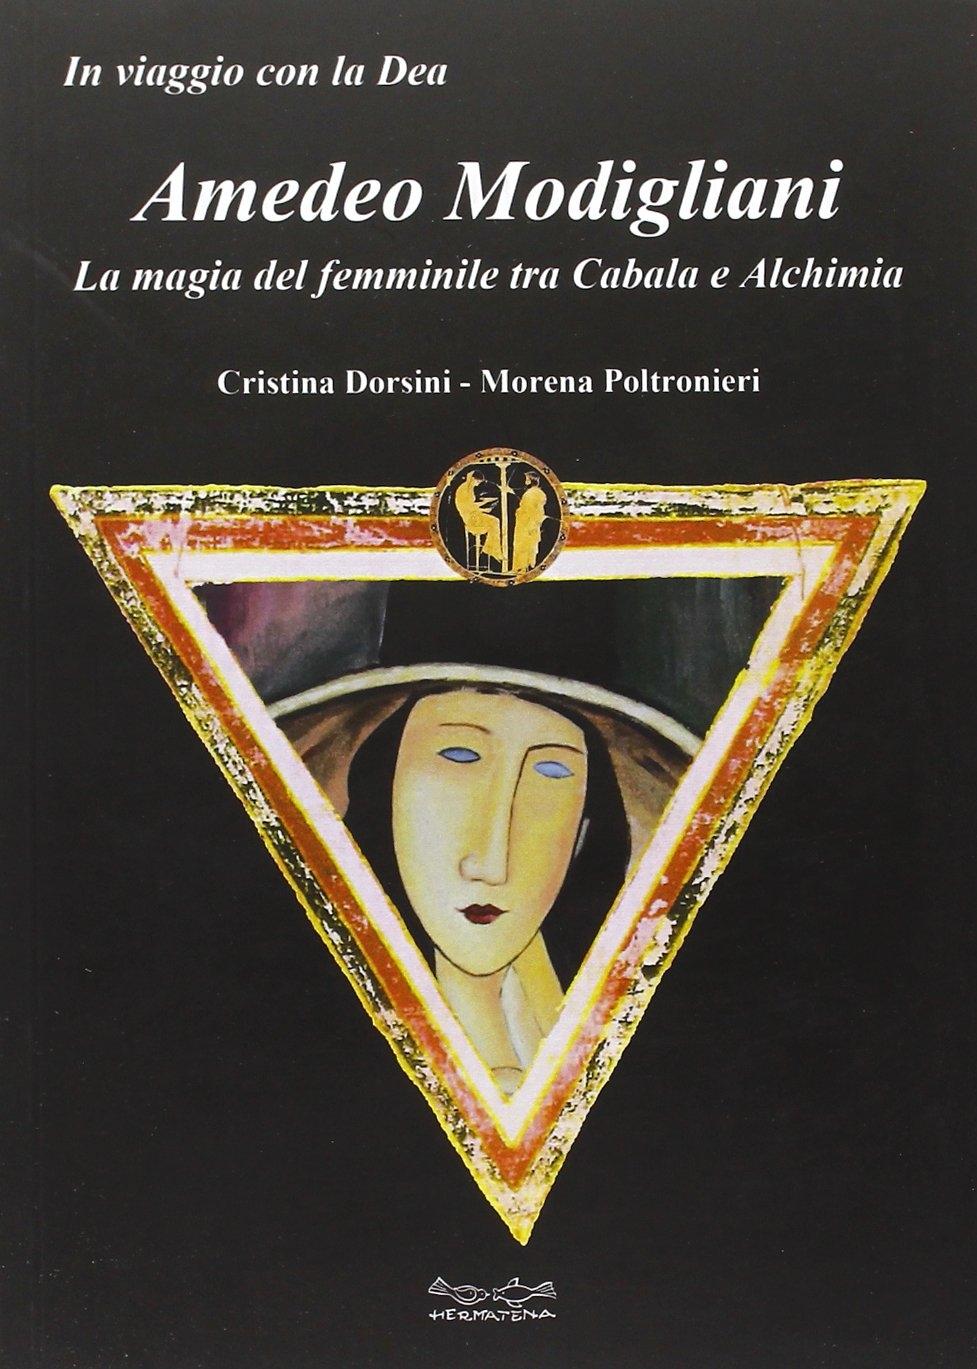 Amedeo Modigliani. La magia del femminile tra cabala e alchimia.